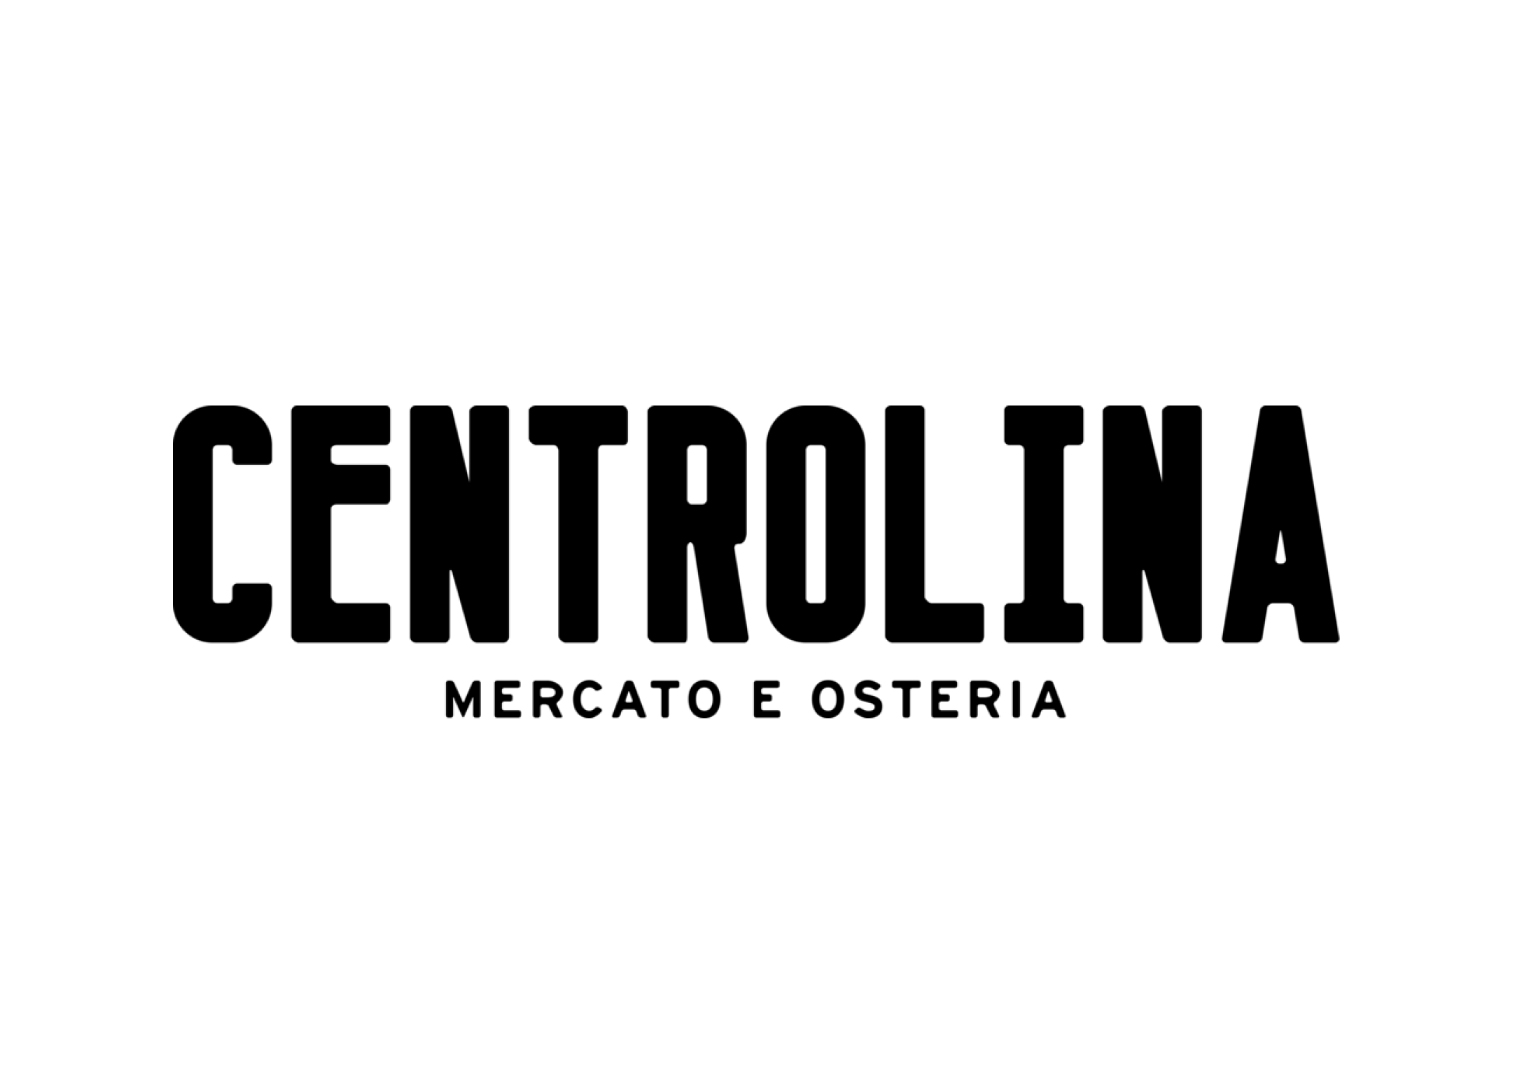 Centrolina